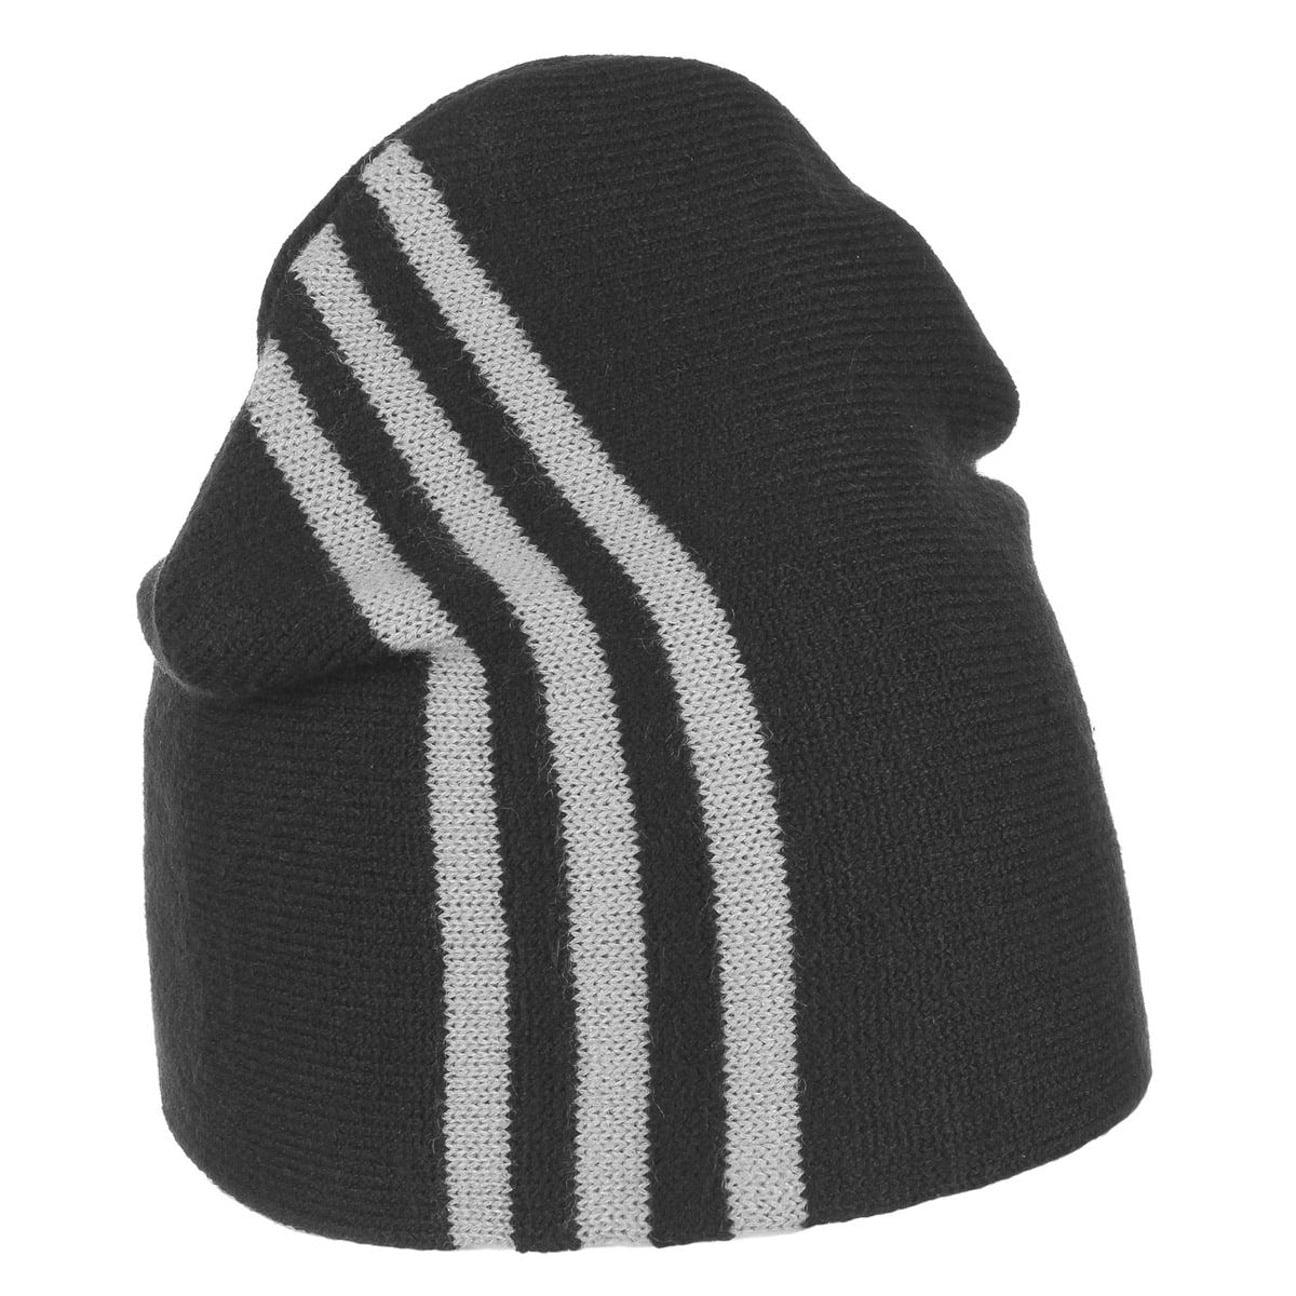 d9b1bc92179d3 Gorro ESS 3 Stripes by adidas - Gorros - sombreroshop.es